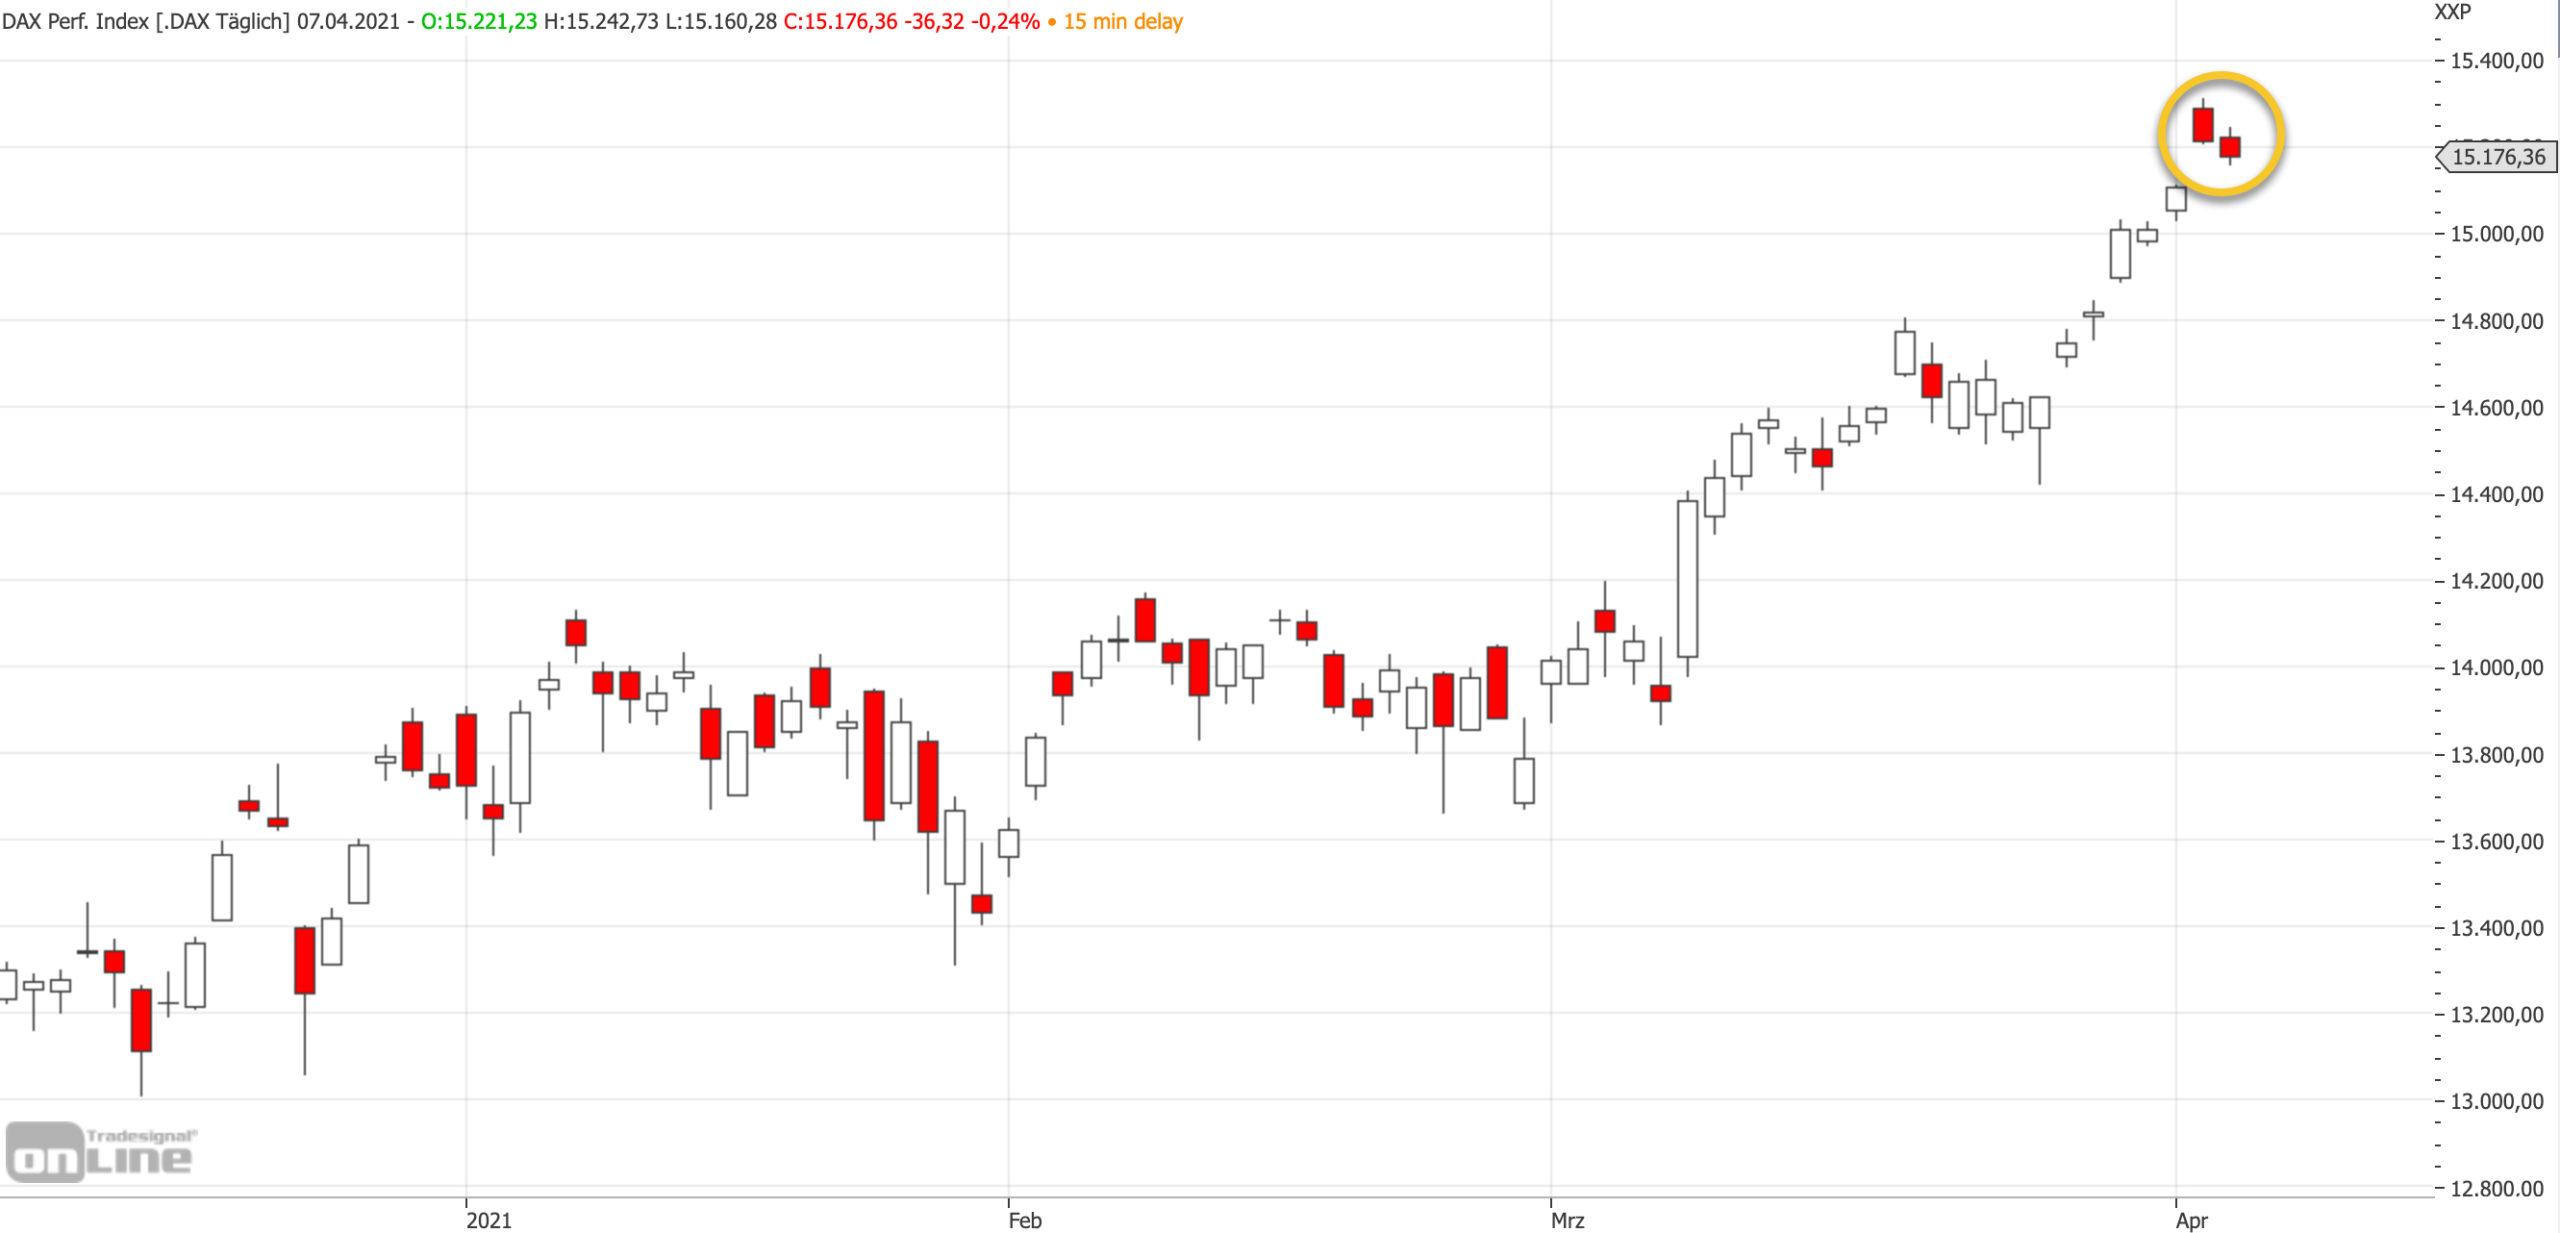 Mittelfristiger DAX-Chart am 07.04.2021